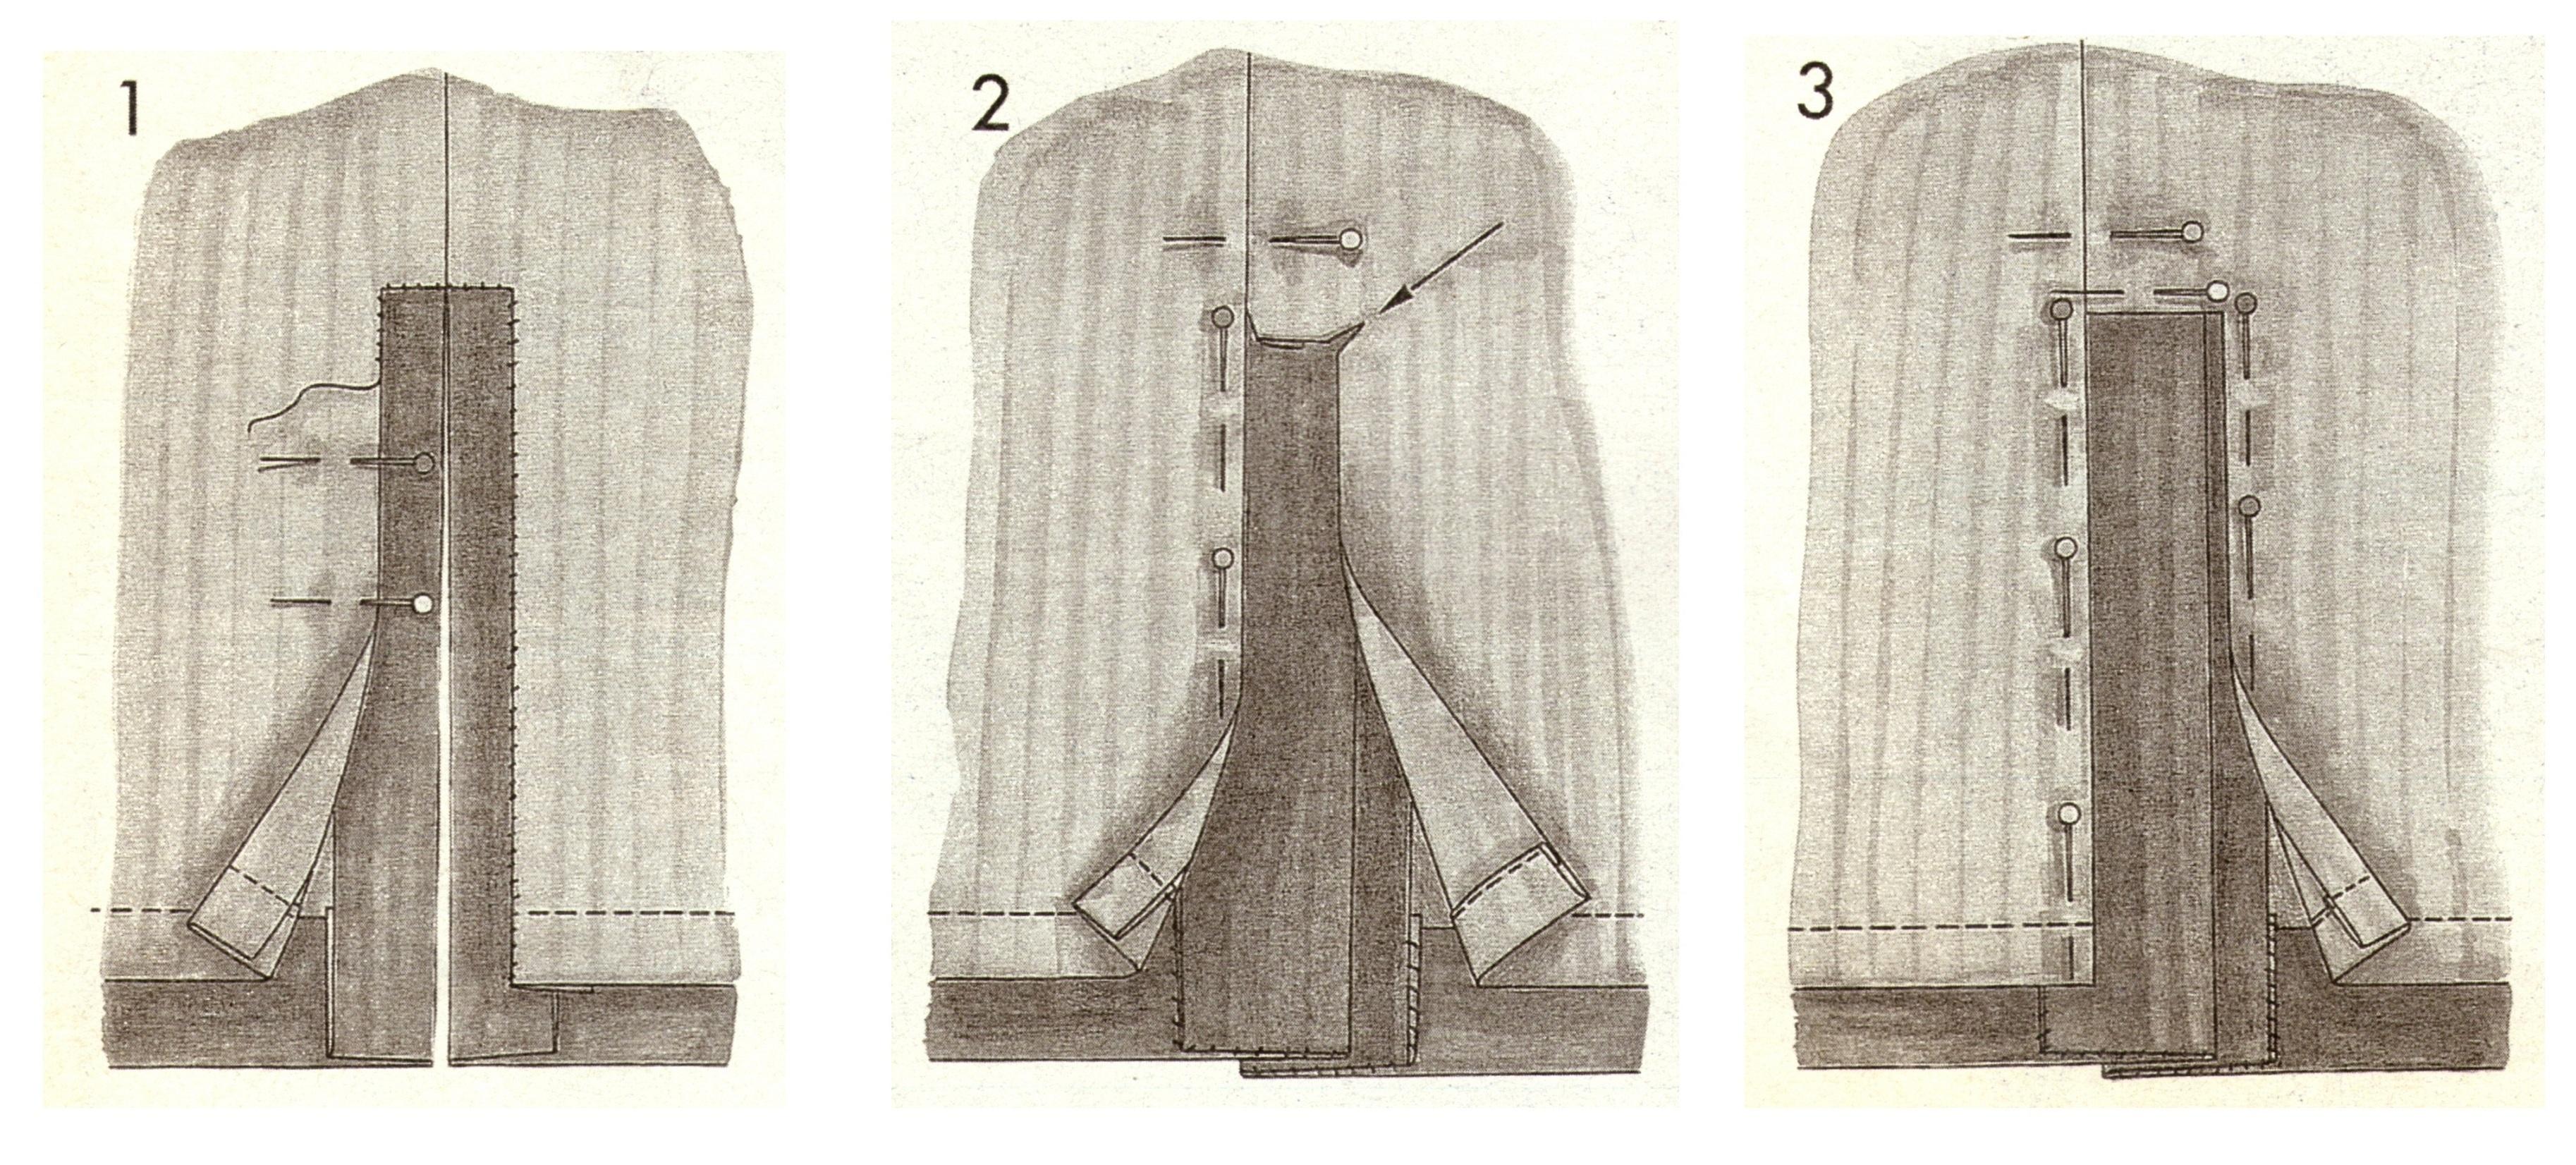 Подкладка на участке разреза на юбке (1-3)